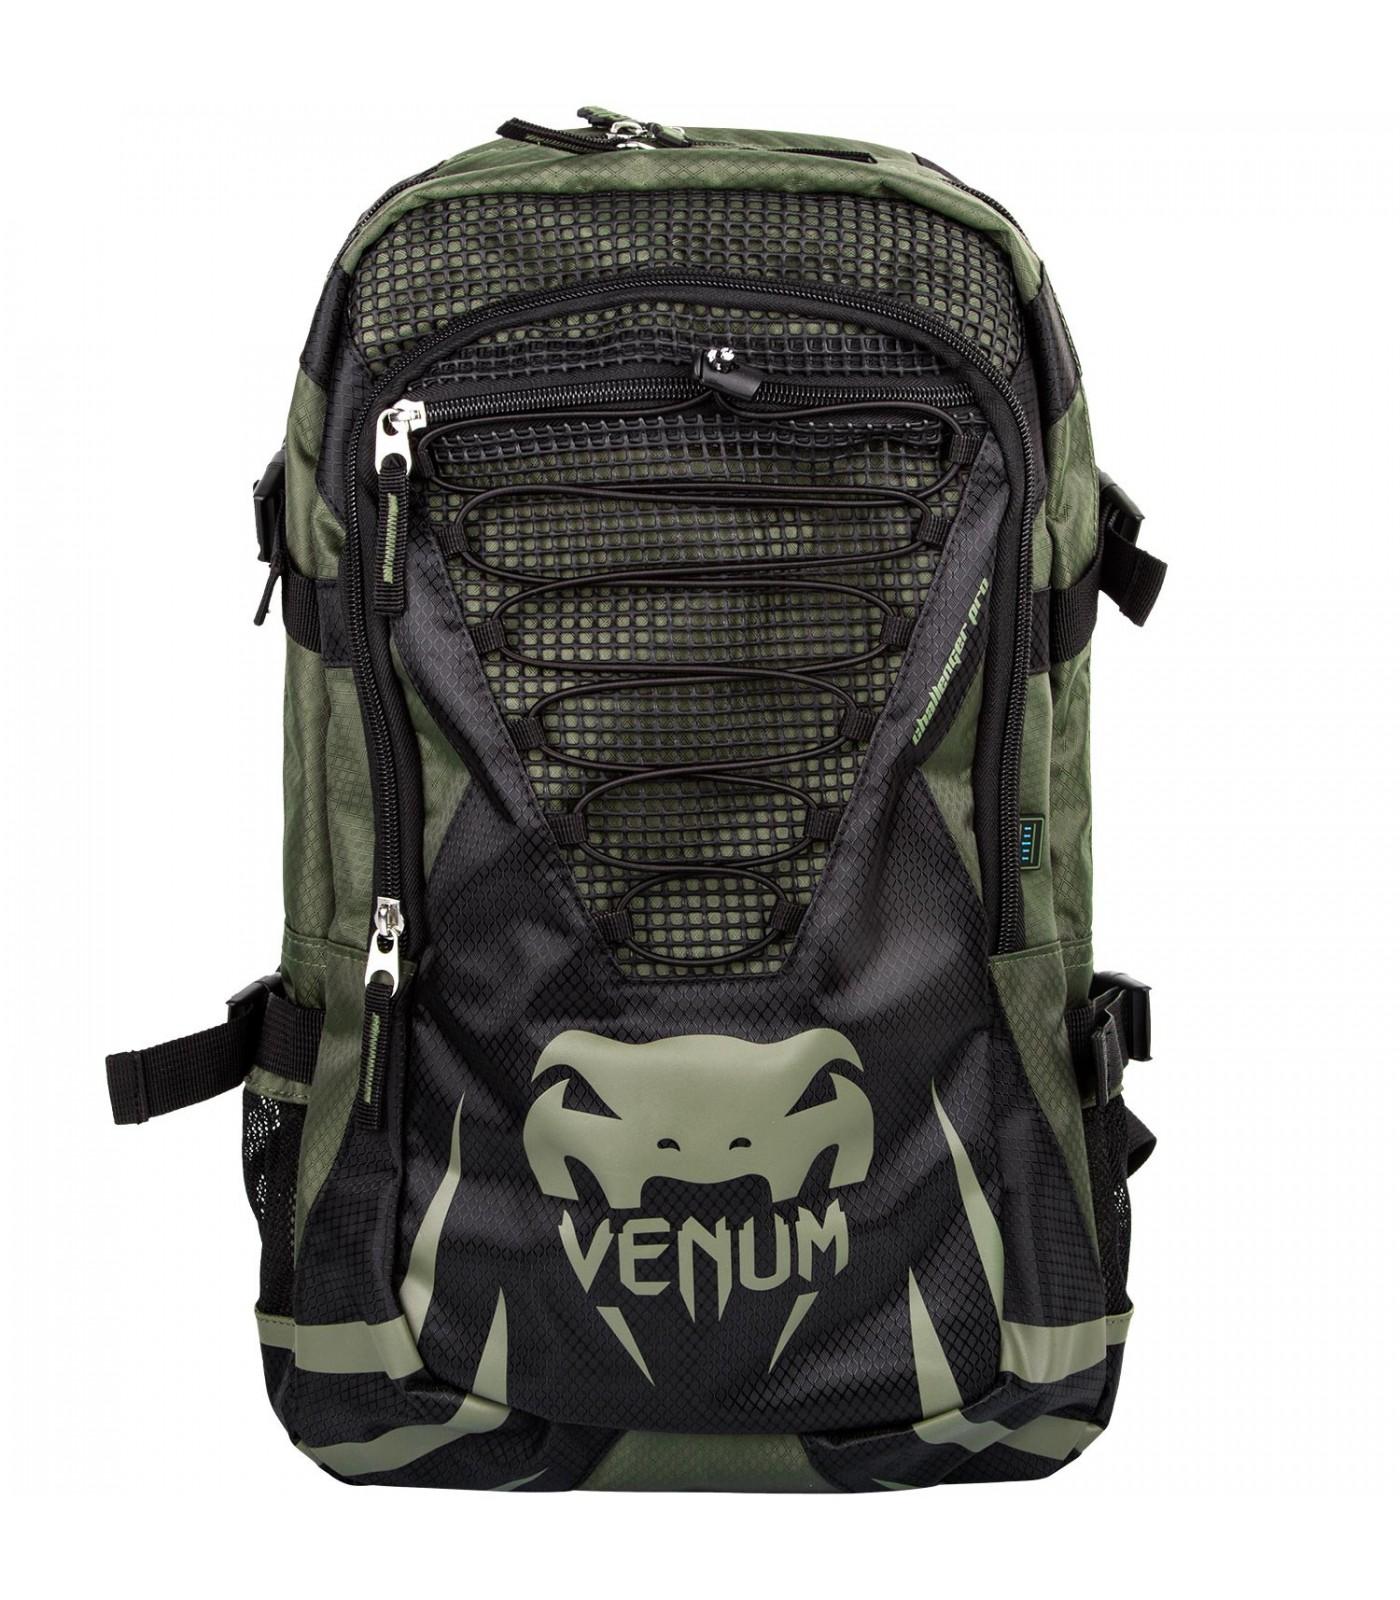 Раница - Venum Challenger Pro Backpack - Khaki/Black